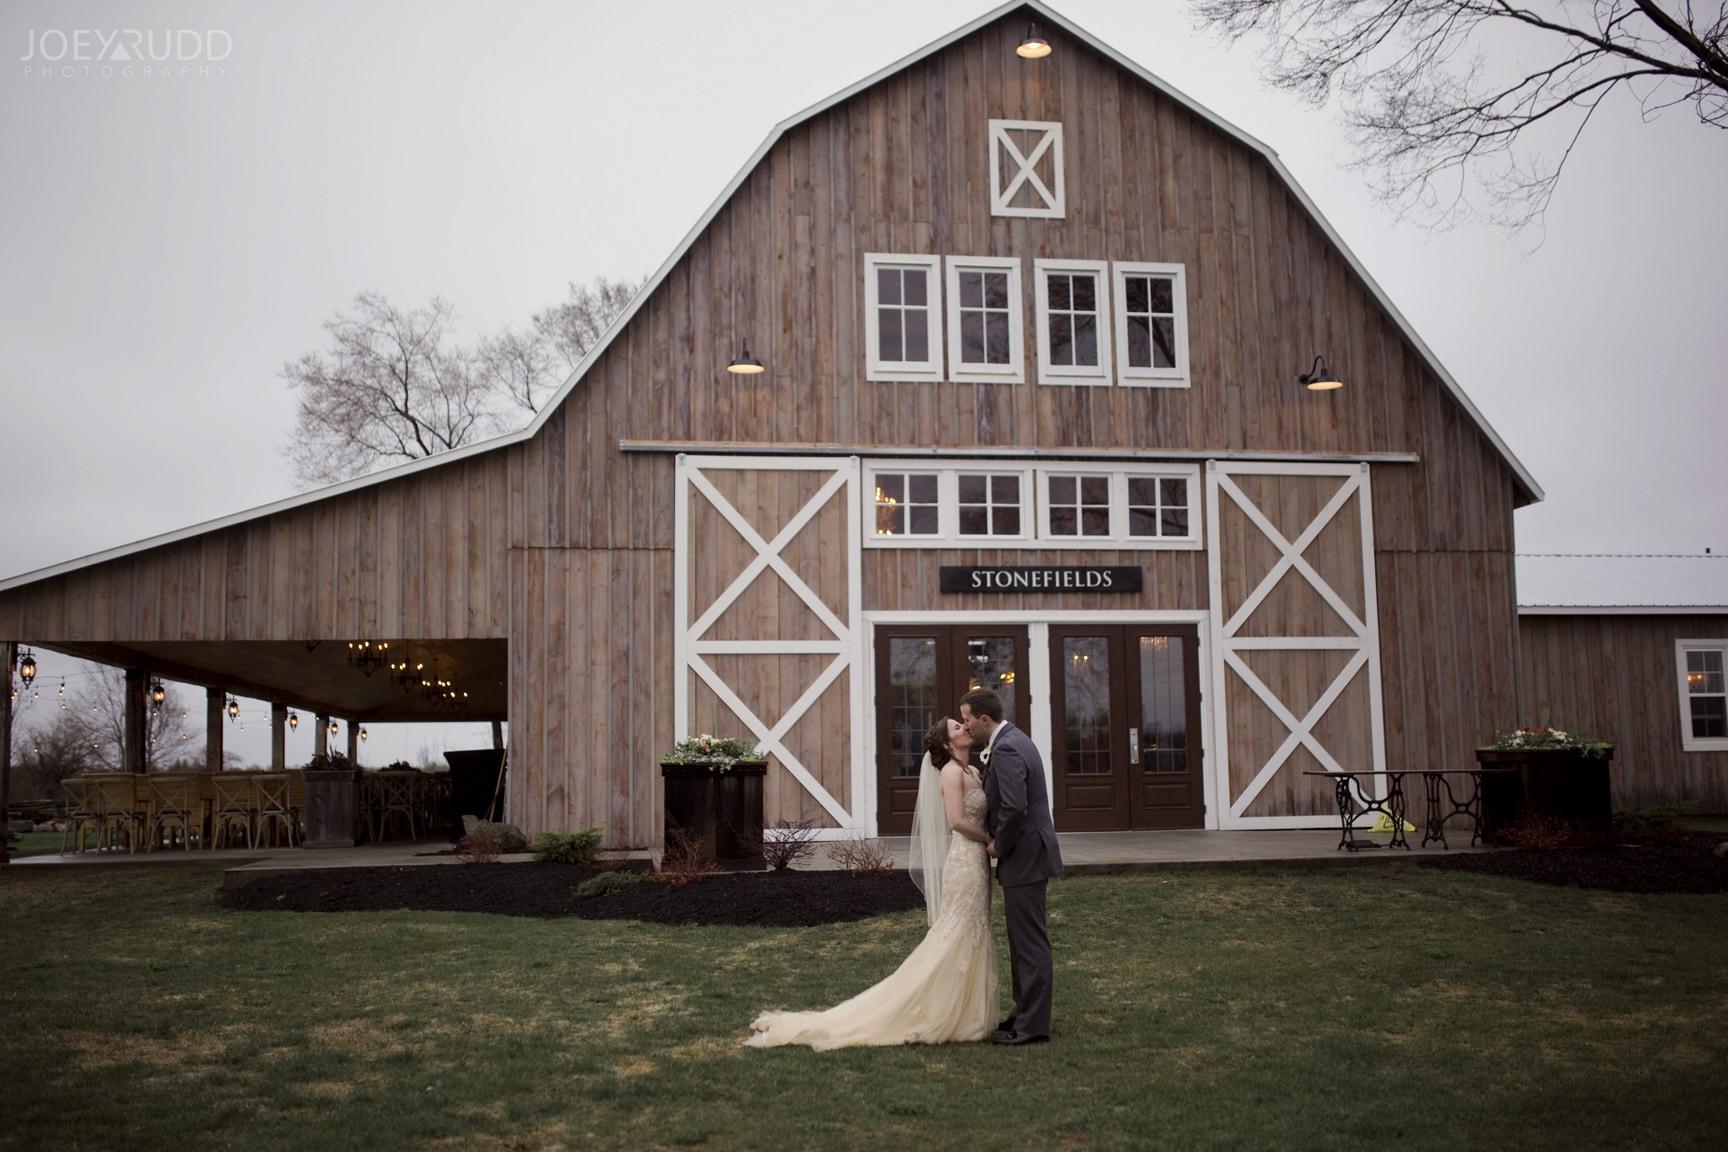 stonefields wedding by ottawa wedding photographer joey rudd photography farm barn